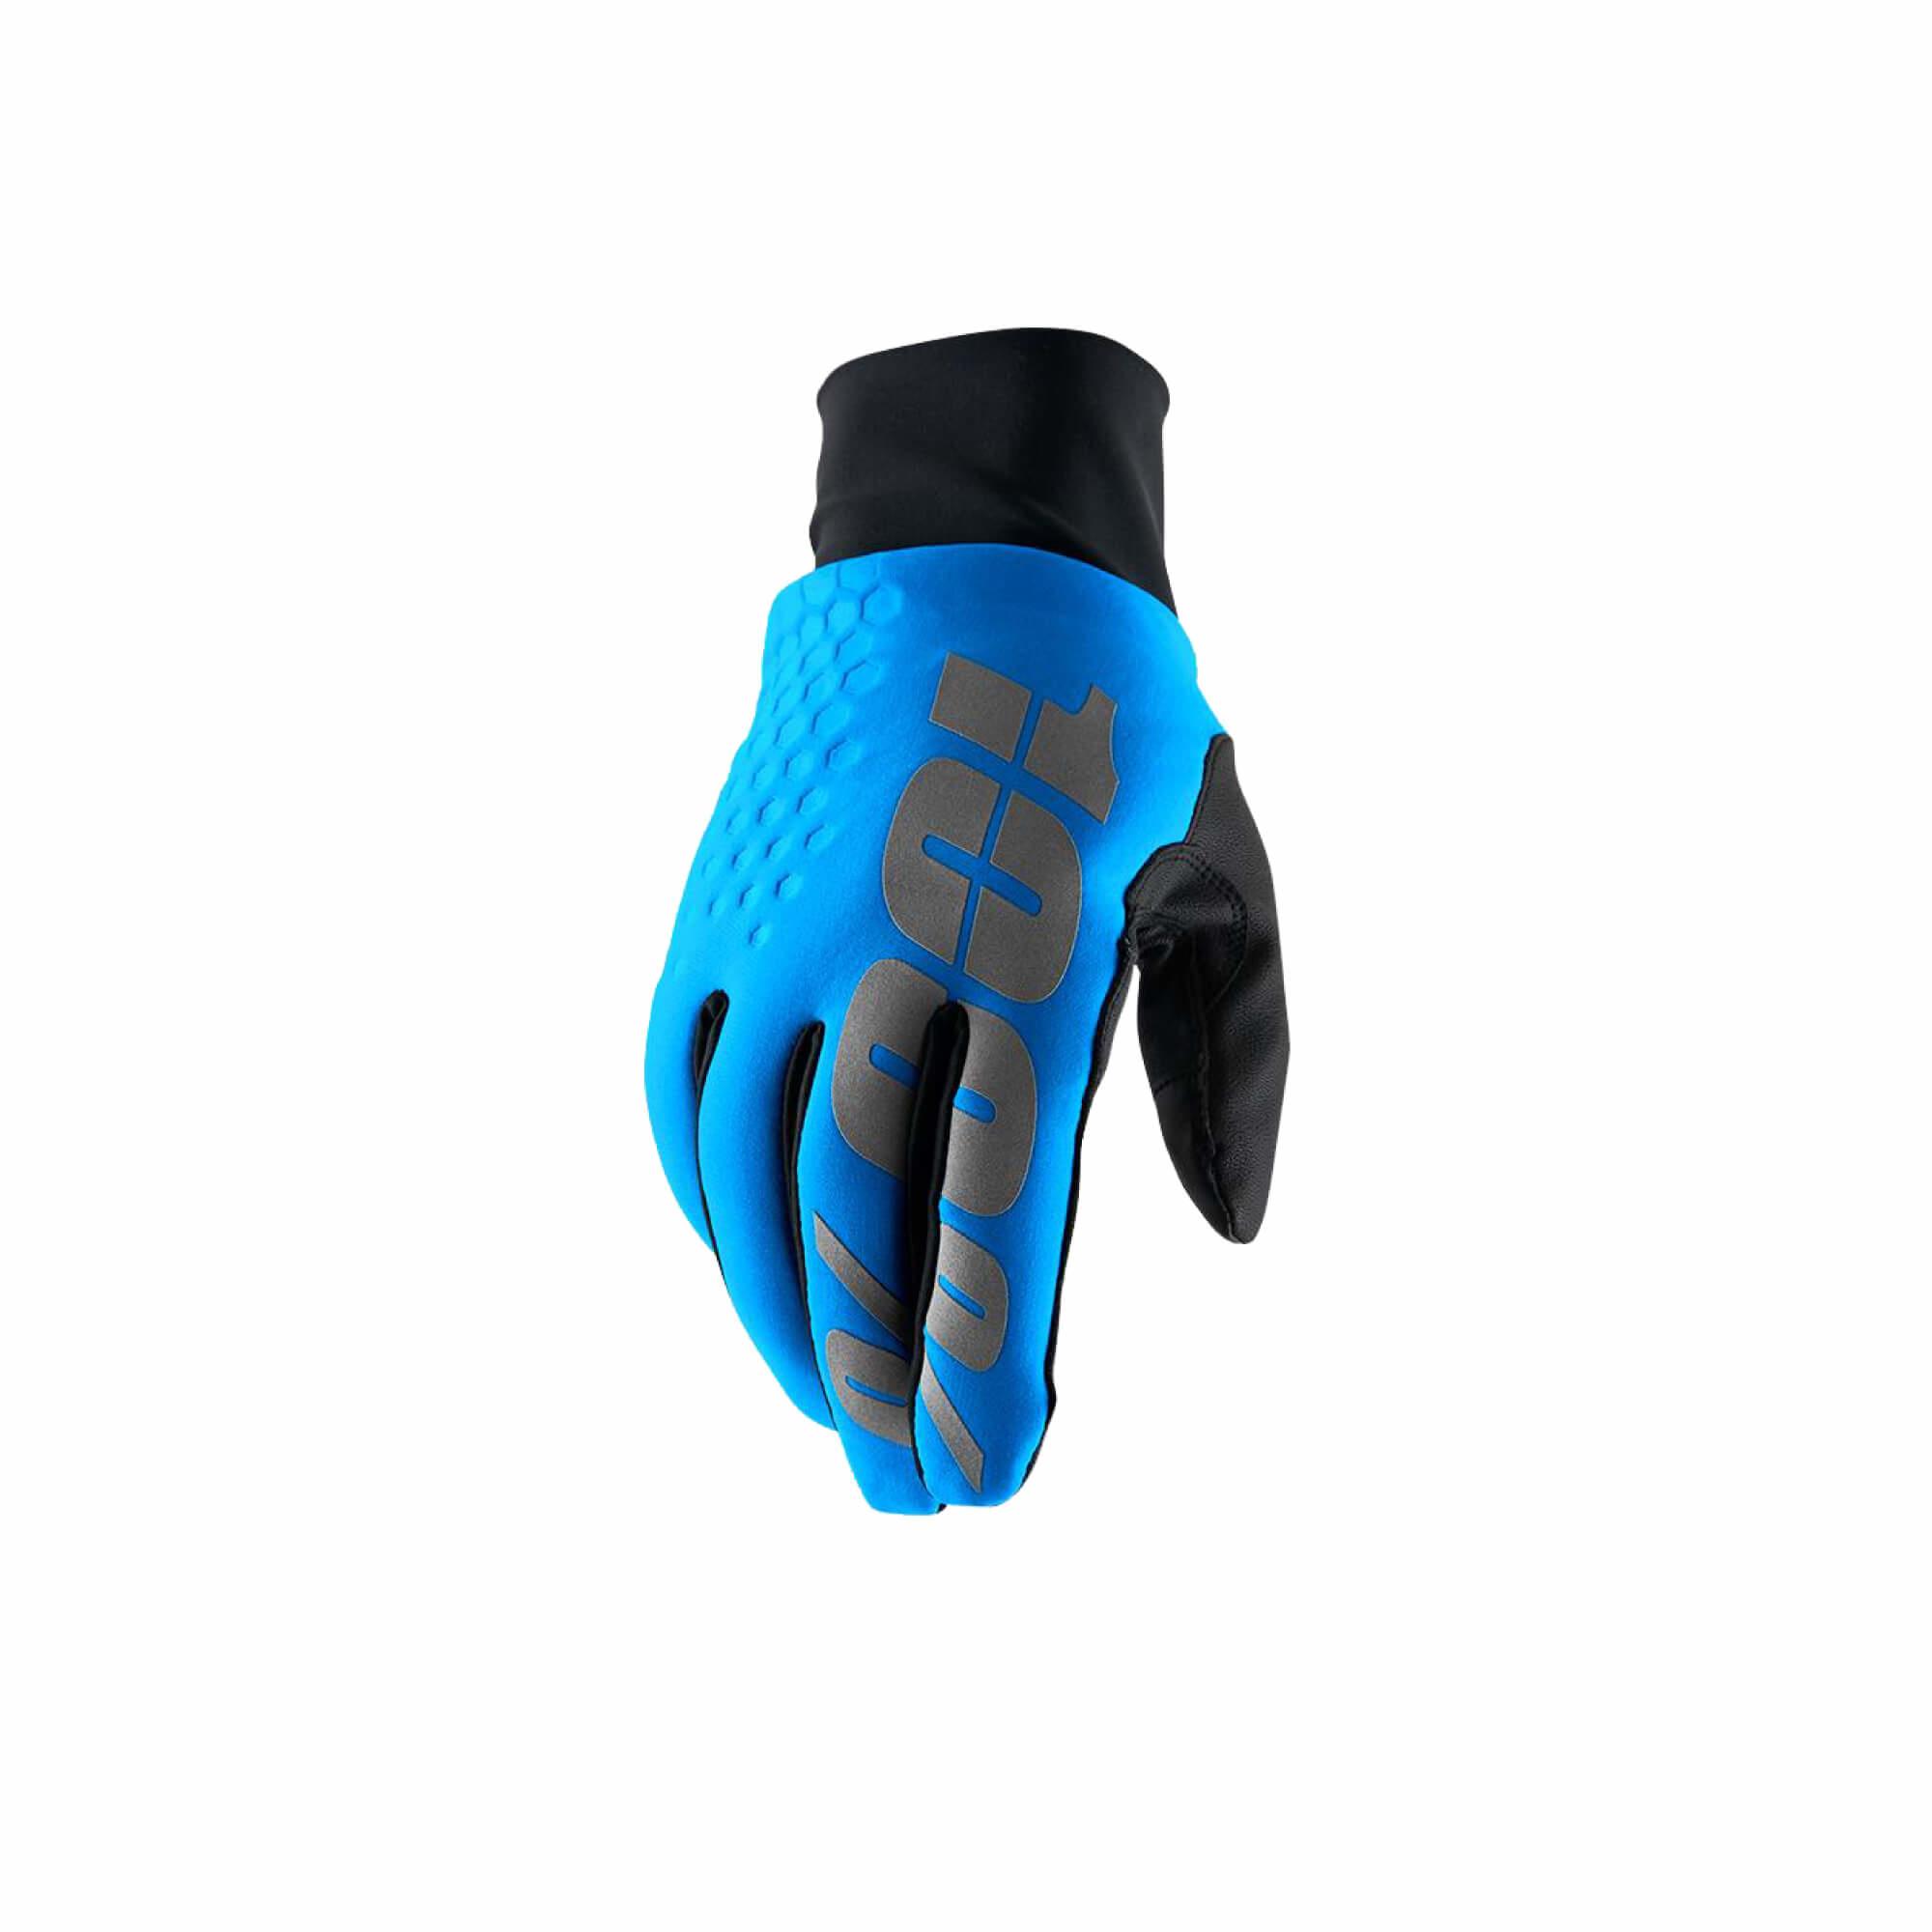 Hydromatic Waterproof Glove 2021-1